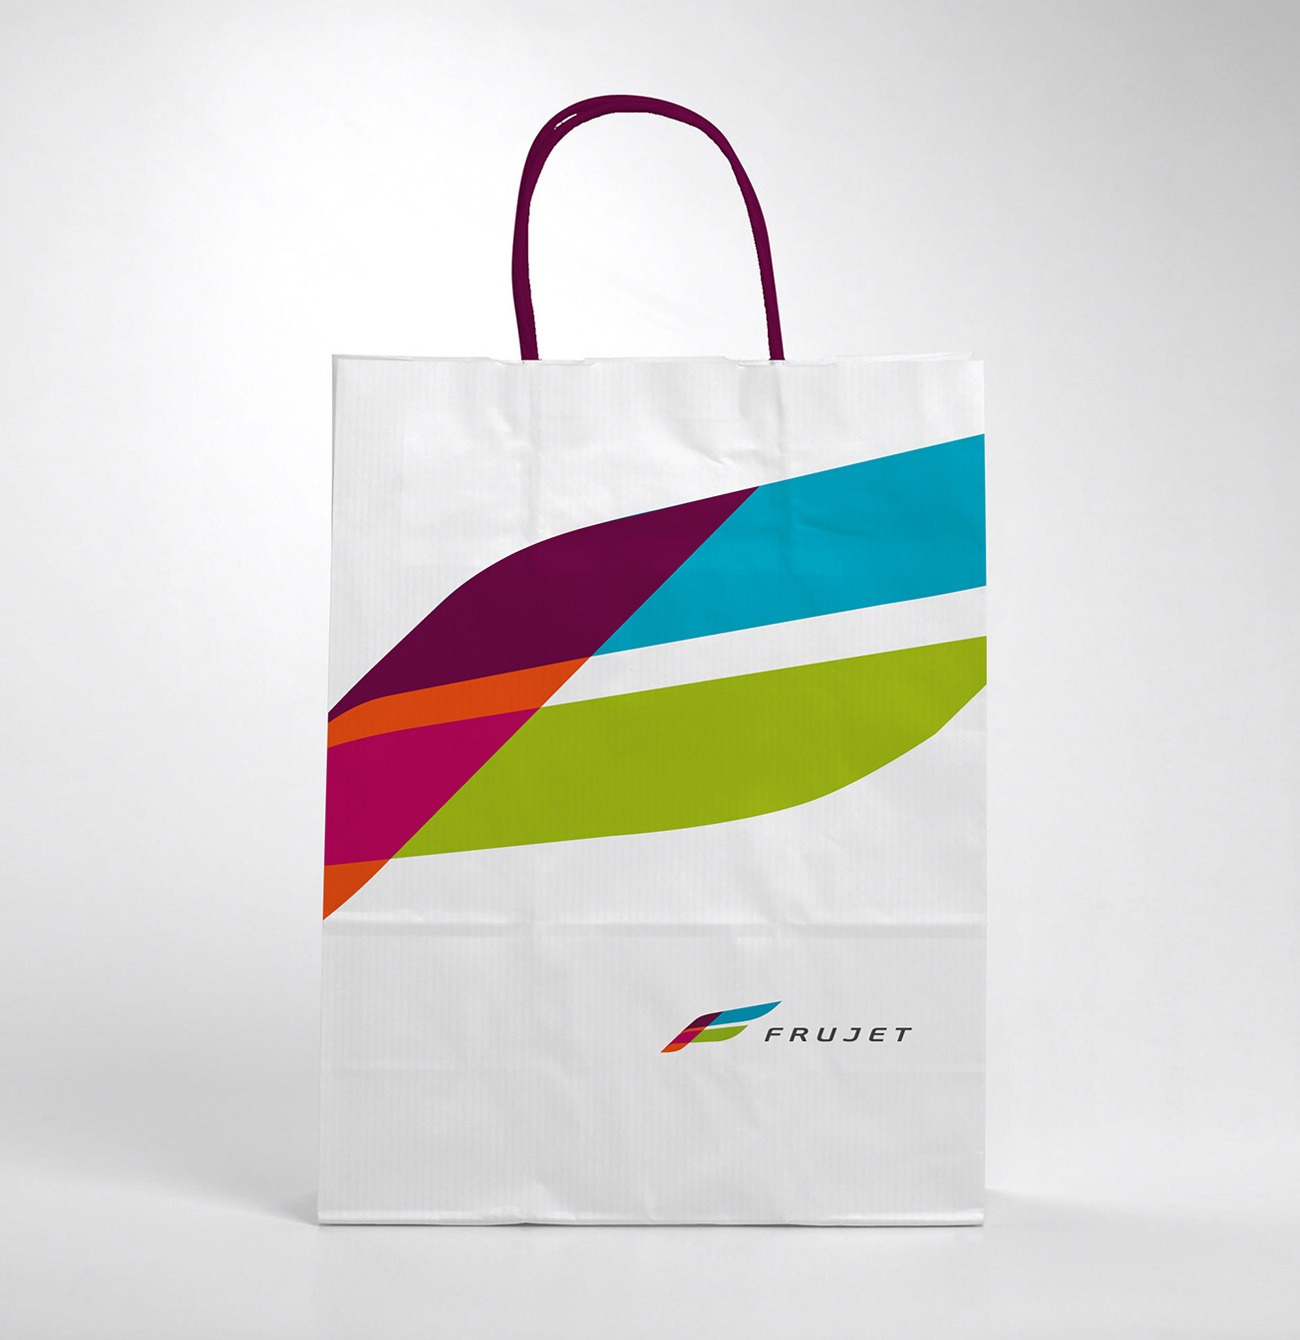 Брендинговое Агентство Асгард, фирменный стиль Frujet, дизайн пакета